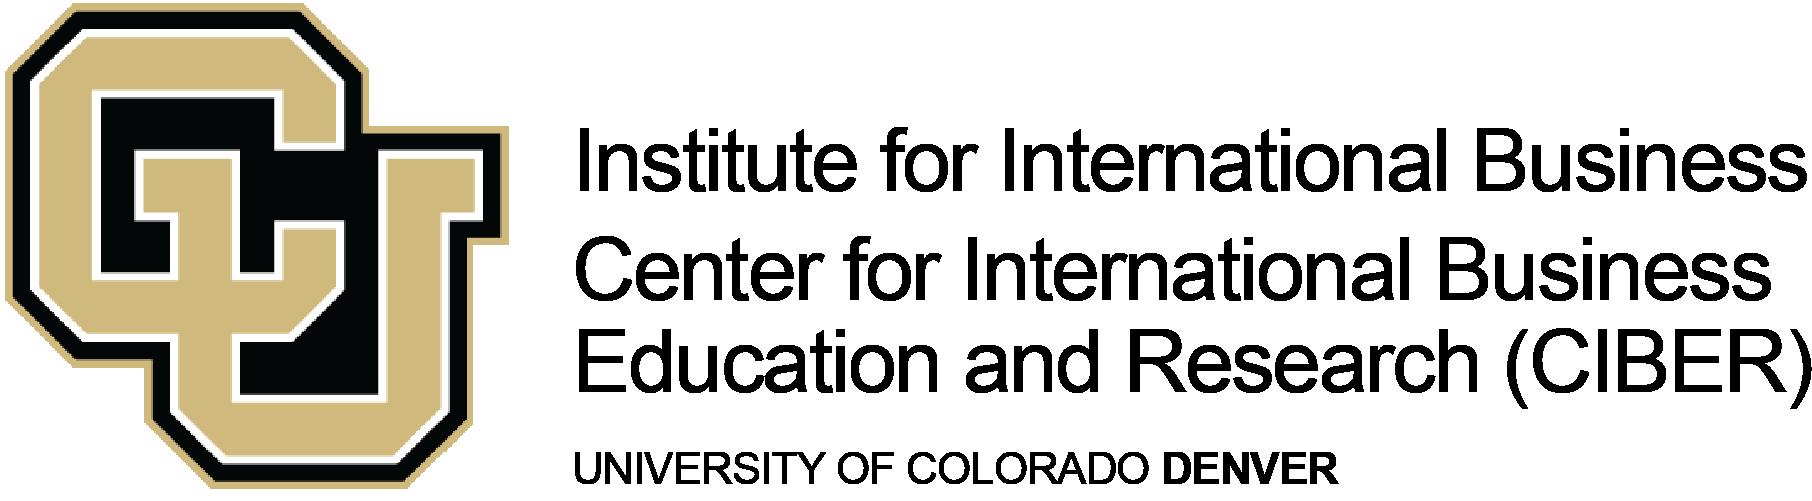 Dual Logo 2